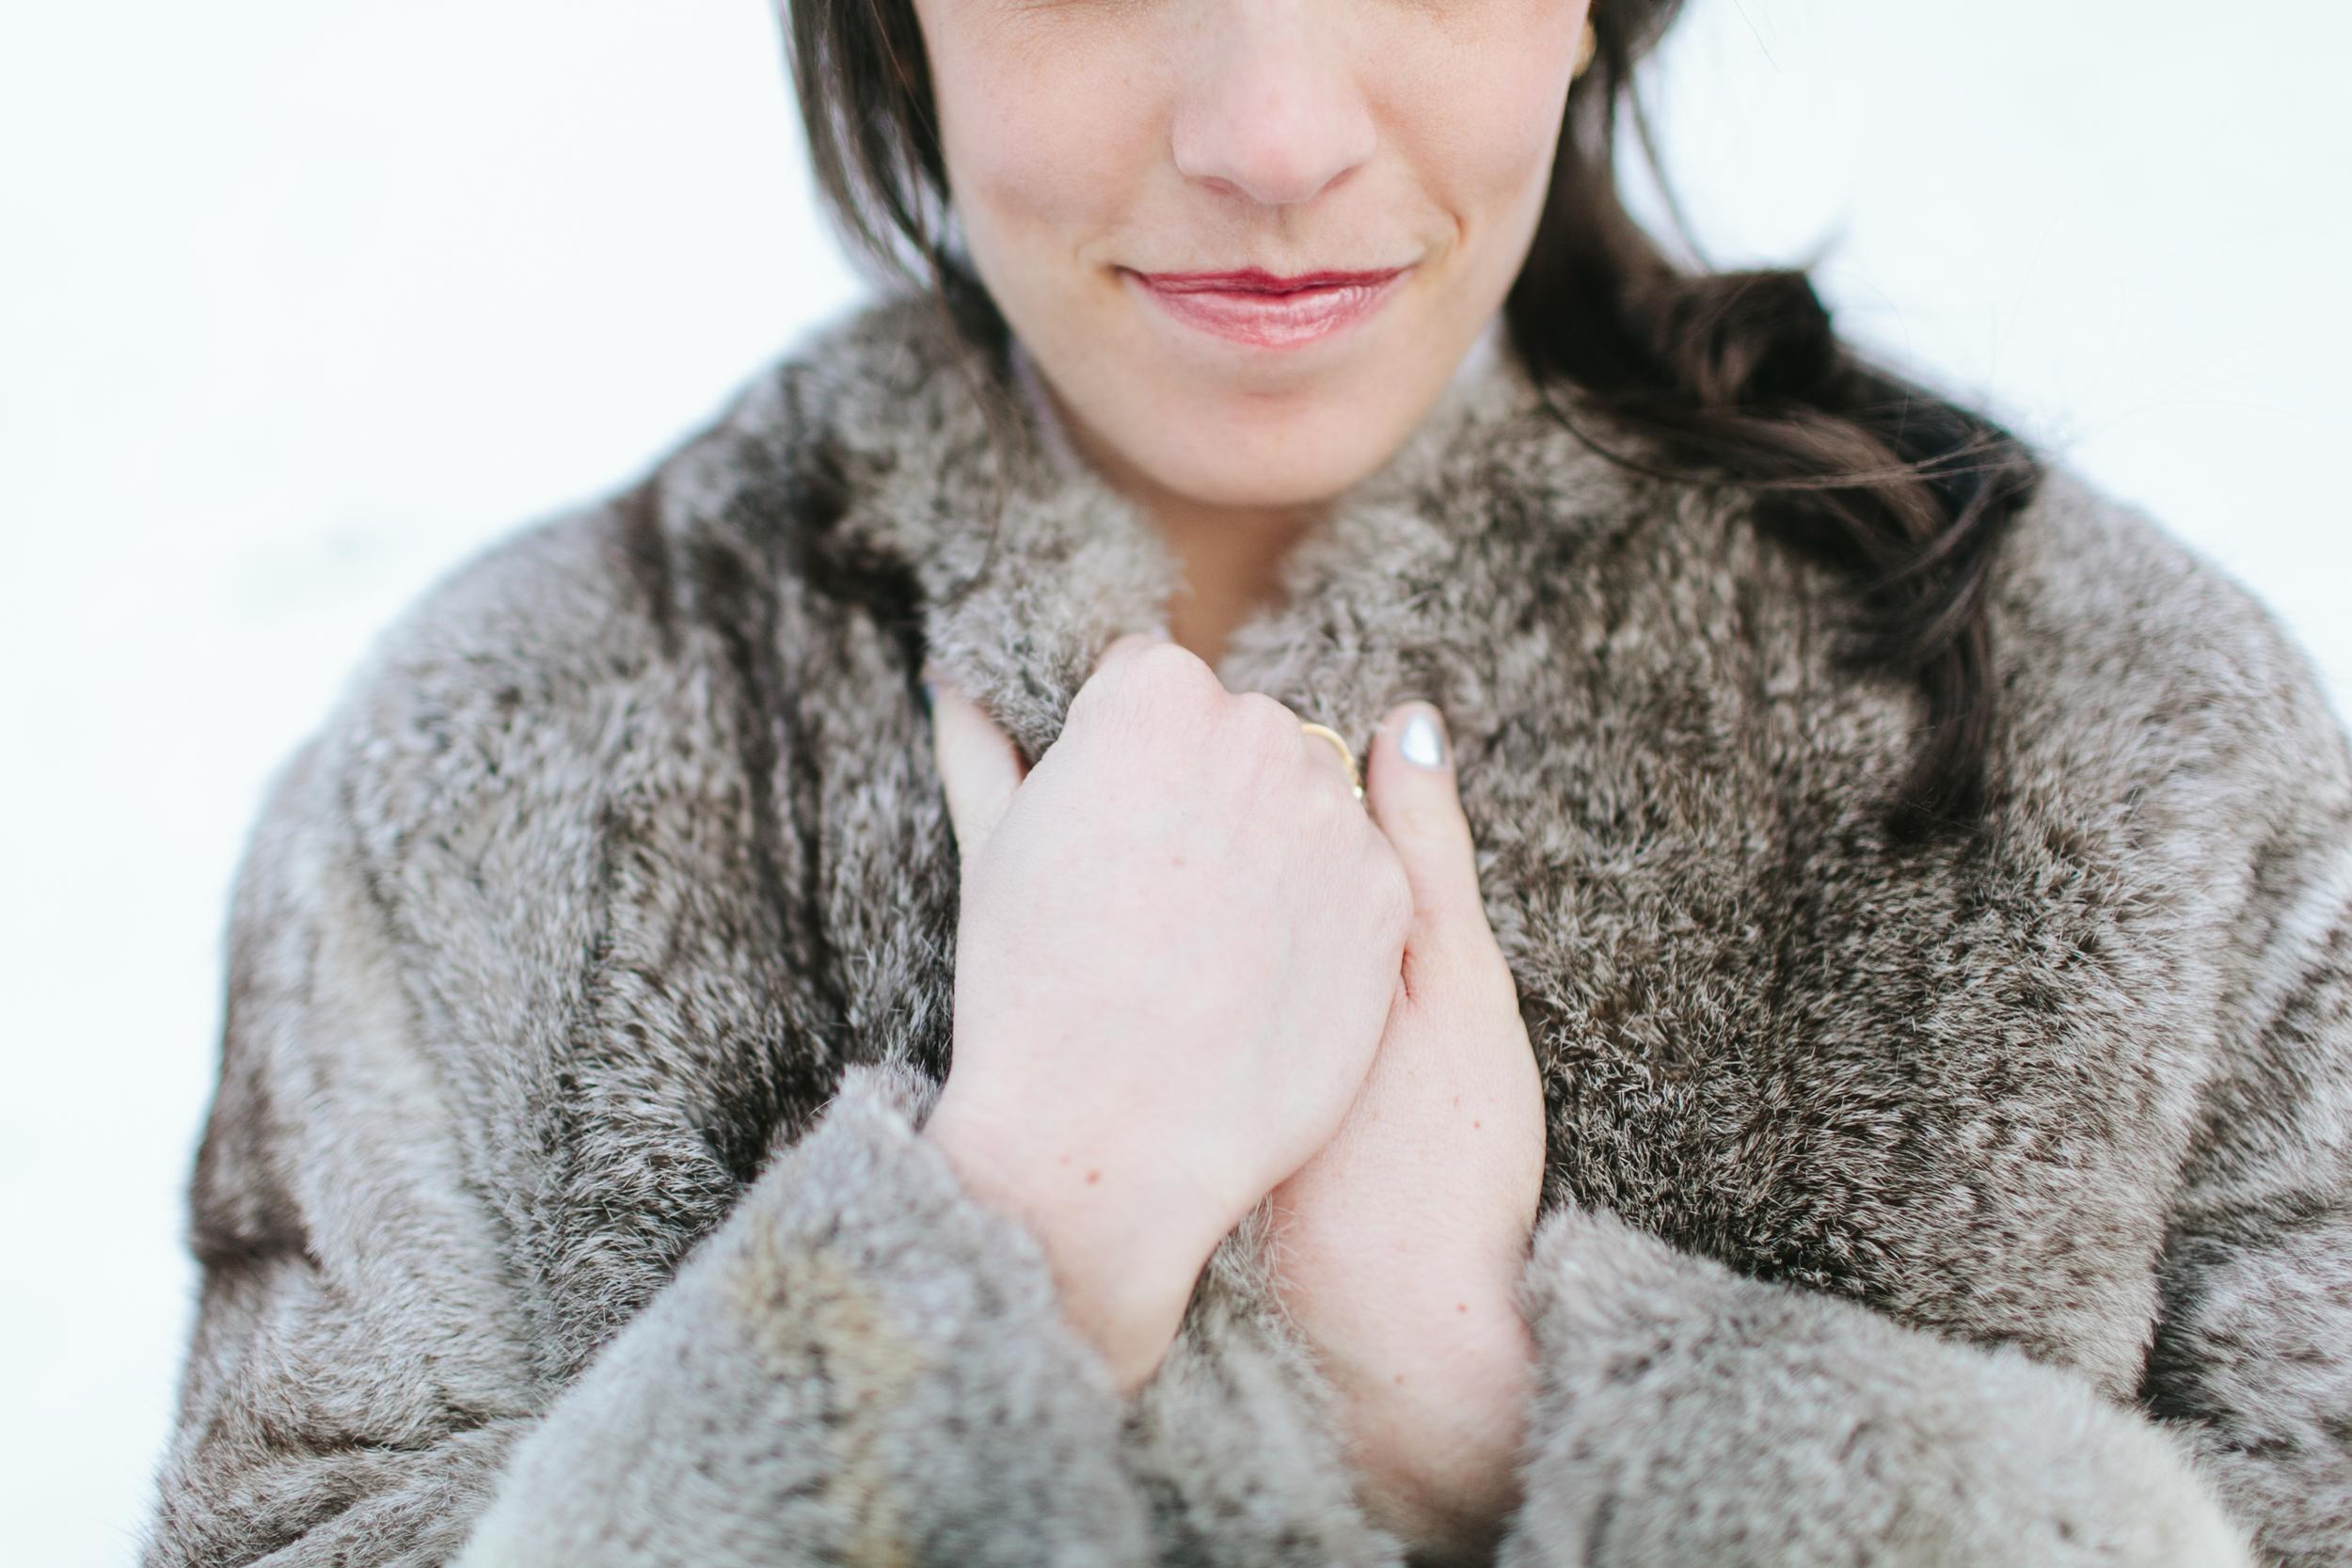 Atlanta-Fashion-Photographer-Kathryn-McCrary-Photography-Snow-Snowlanta-Fur-Coat-42.jpg